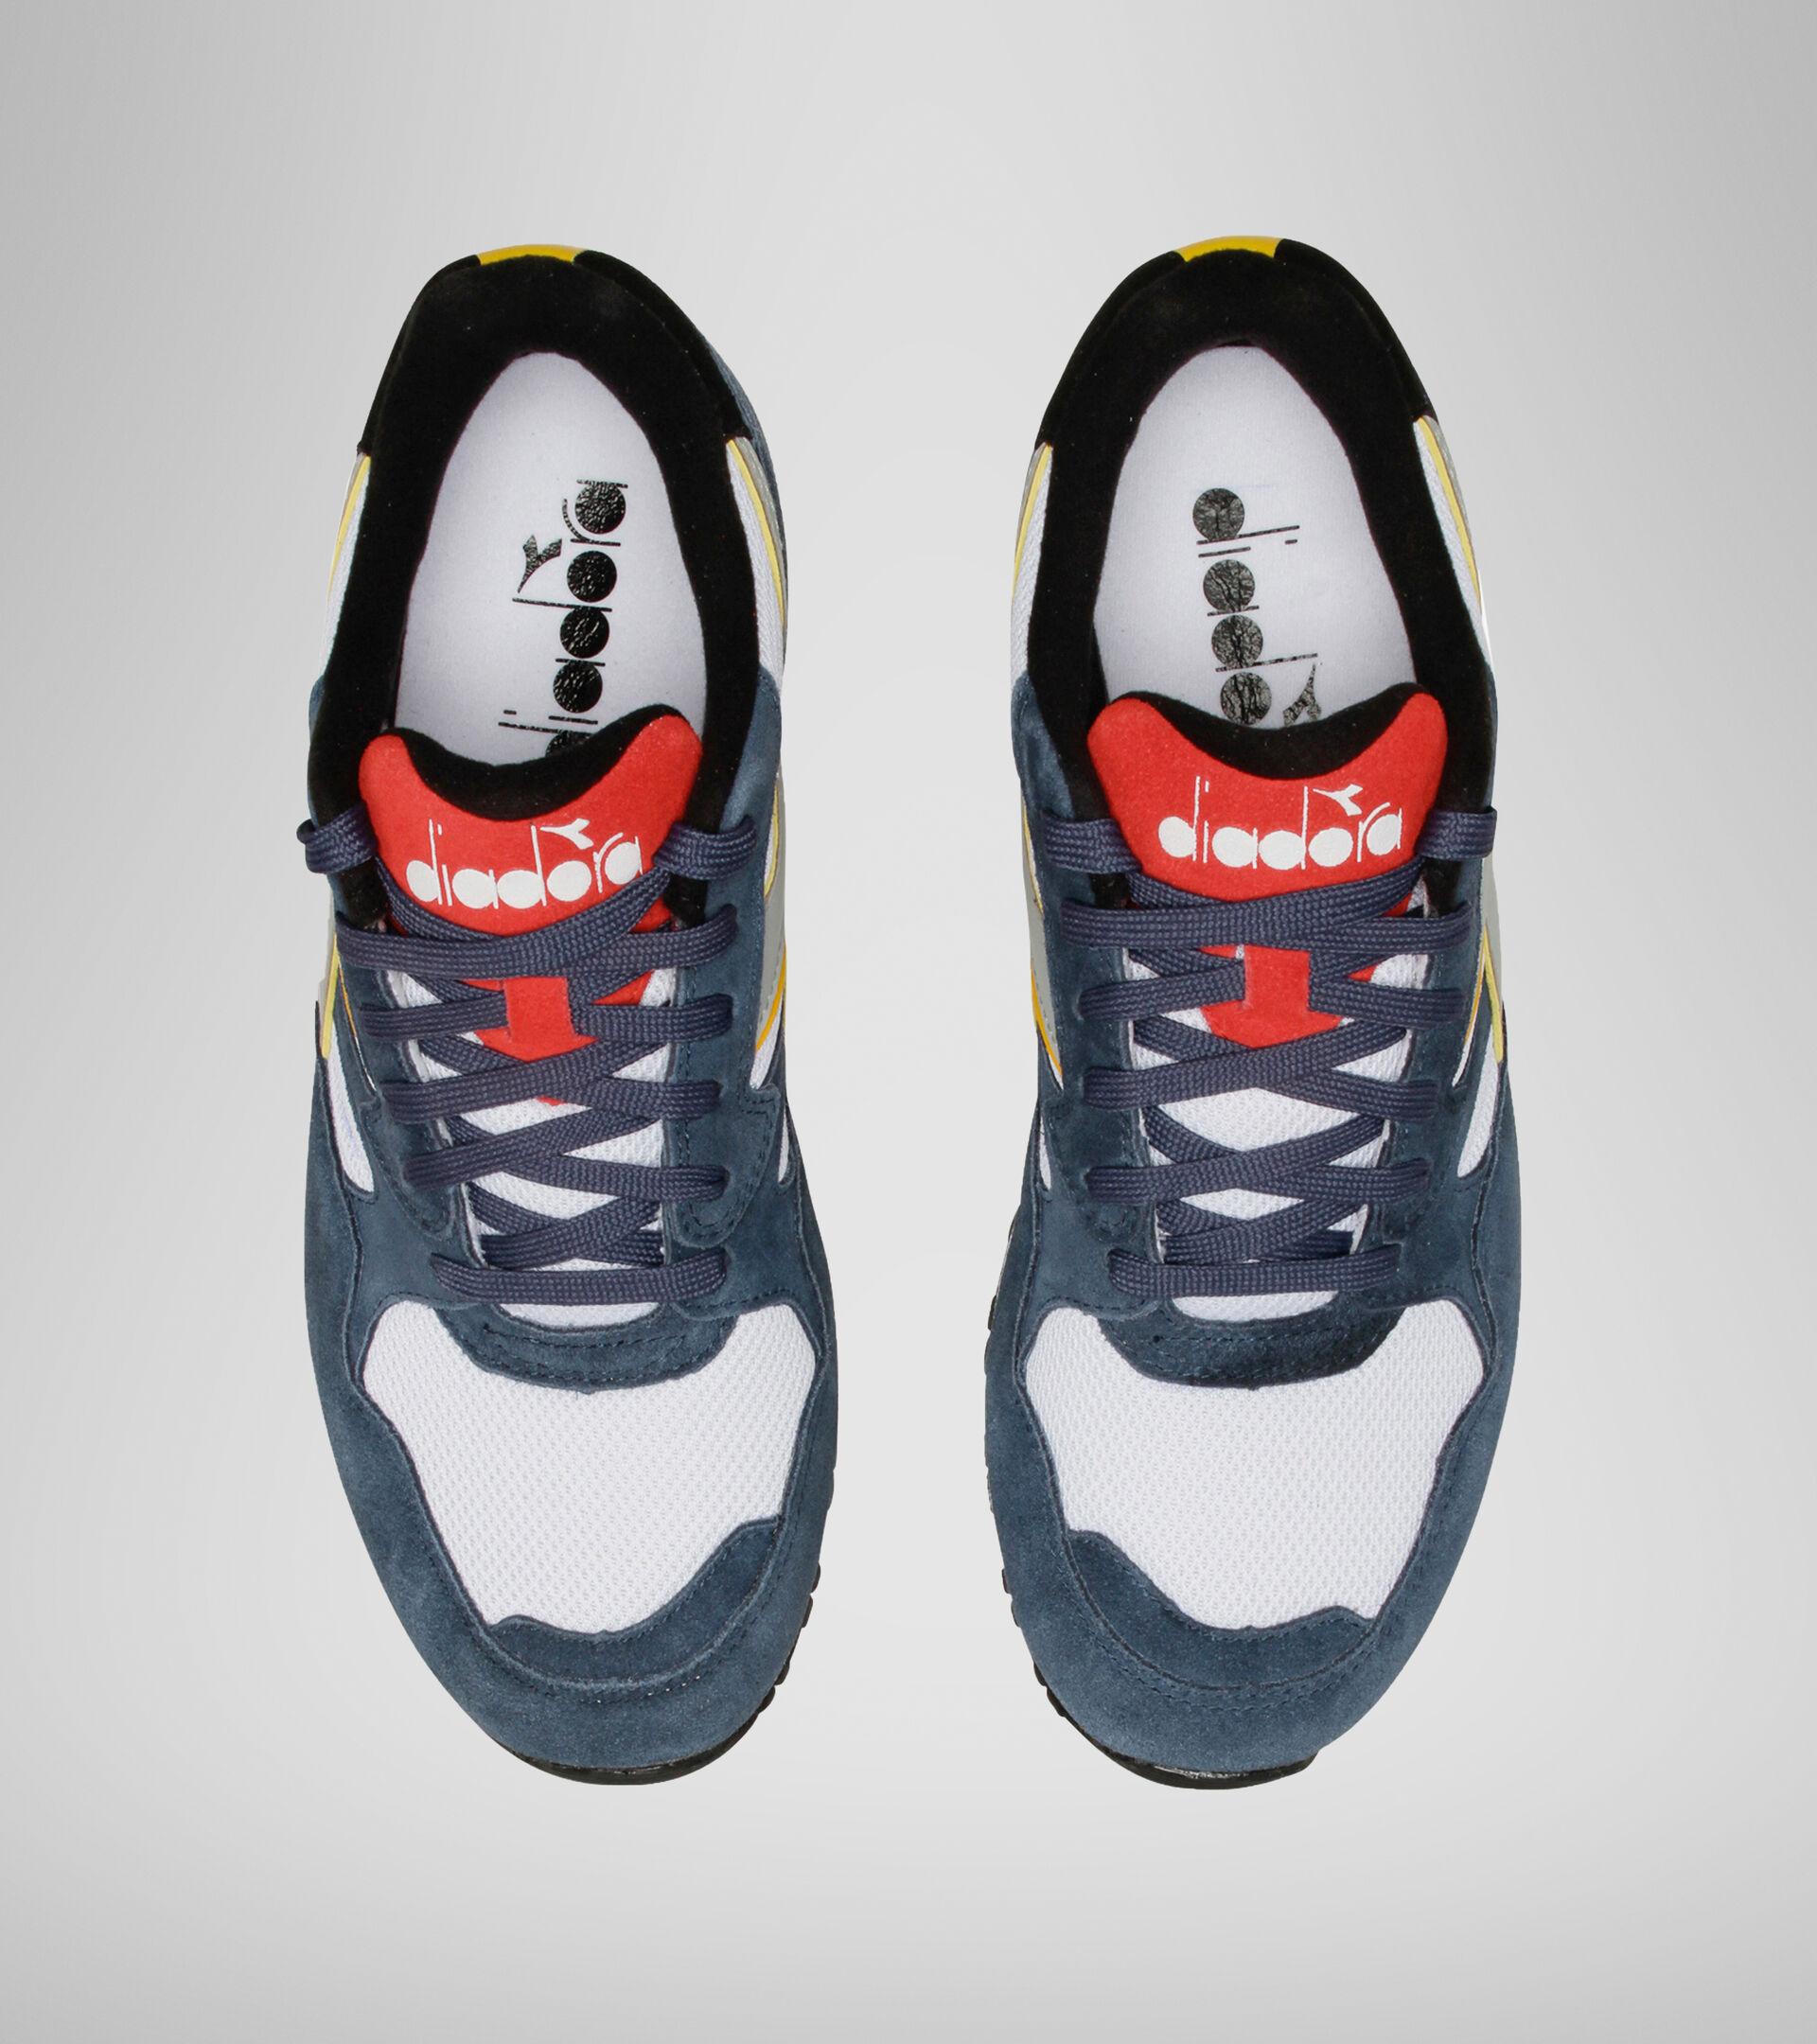 Sneaker - Unisex N902 S DNKL JEANSTOFF BL/WSS/FEUERROT - Diadora